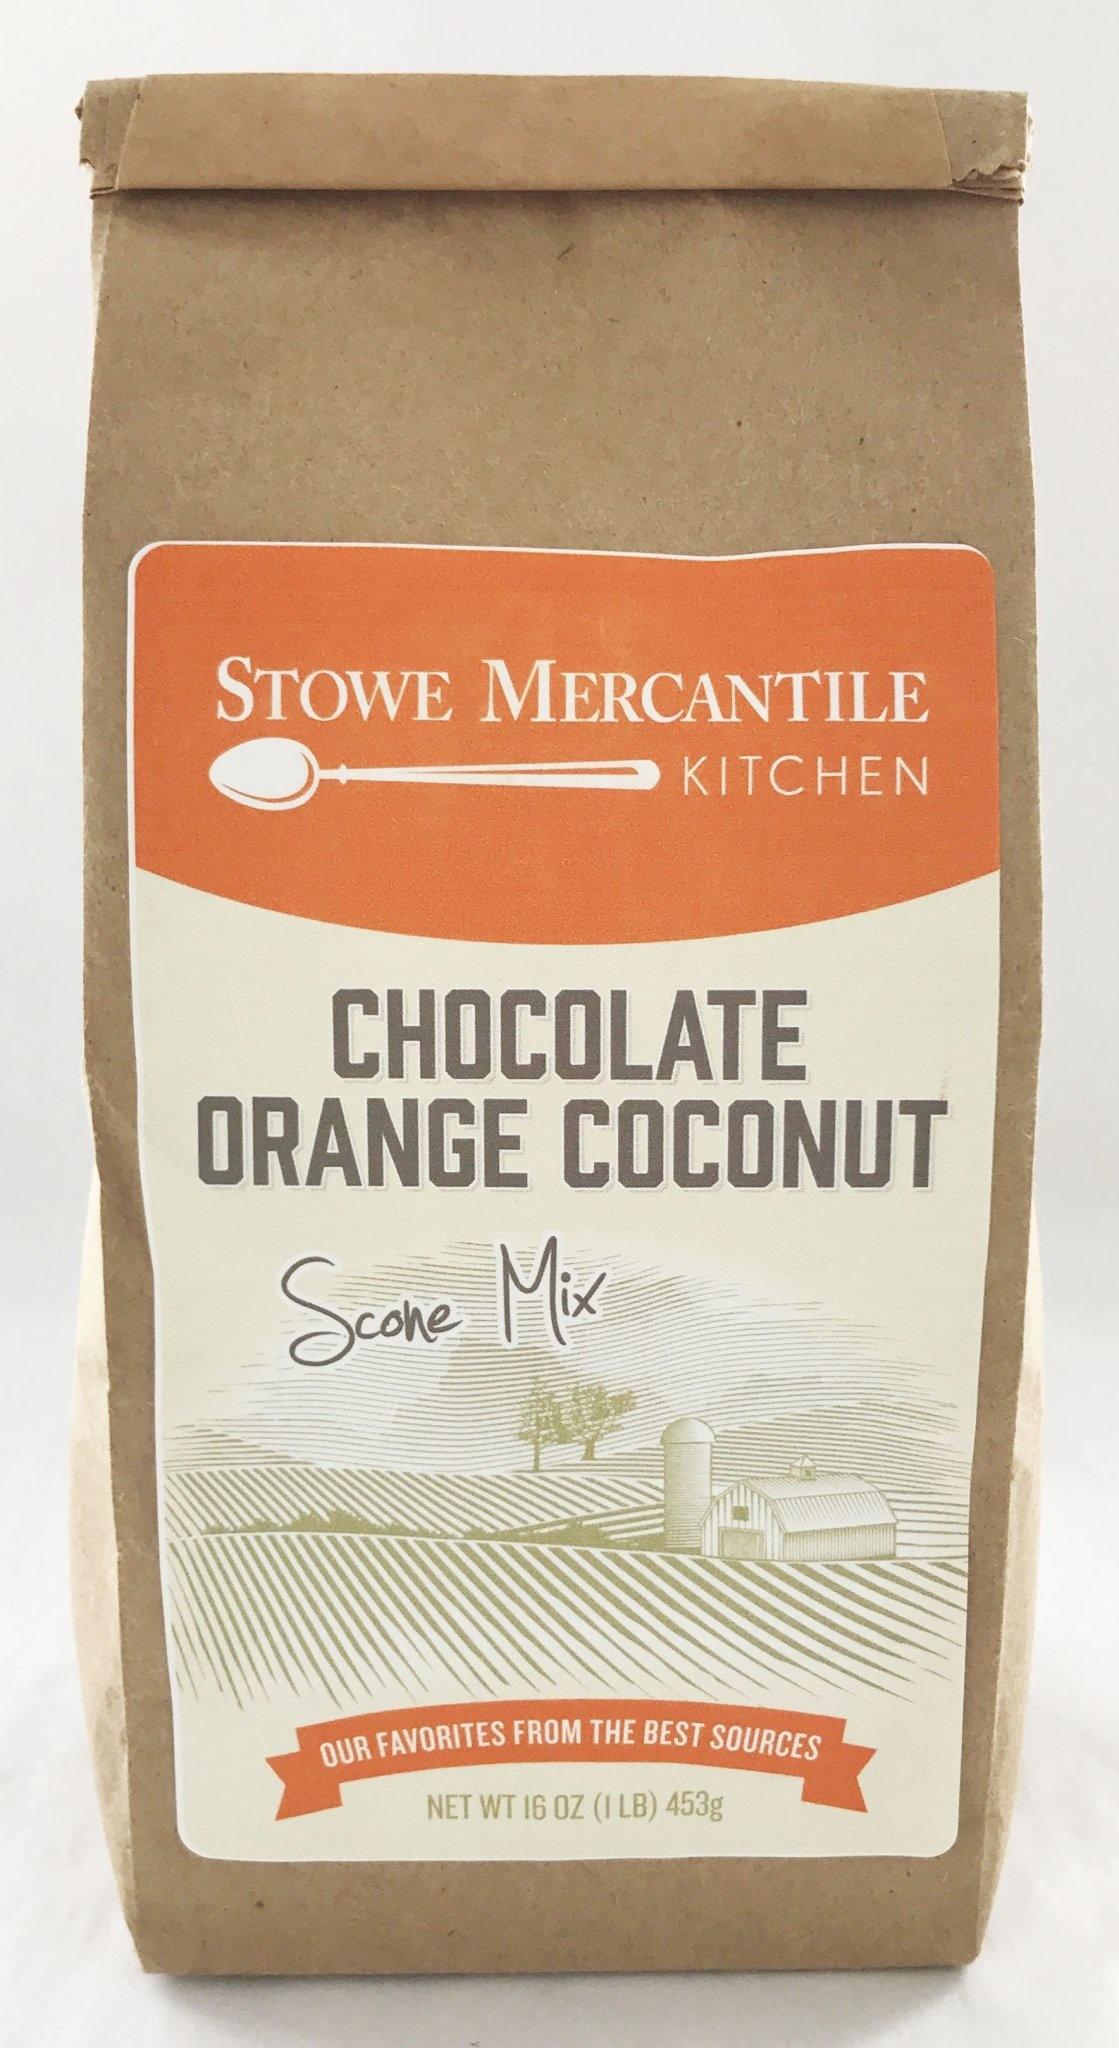 Stowe Mercantile Kitchen Scone Mix - Chocolate Orange Coconut